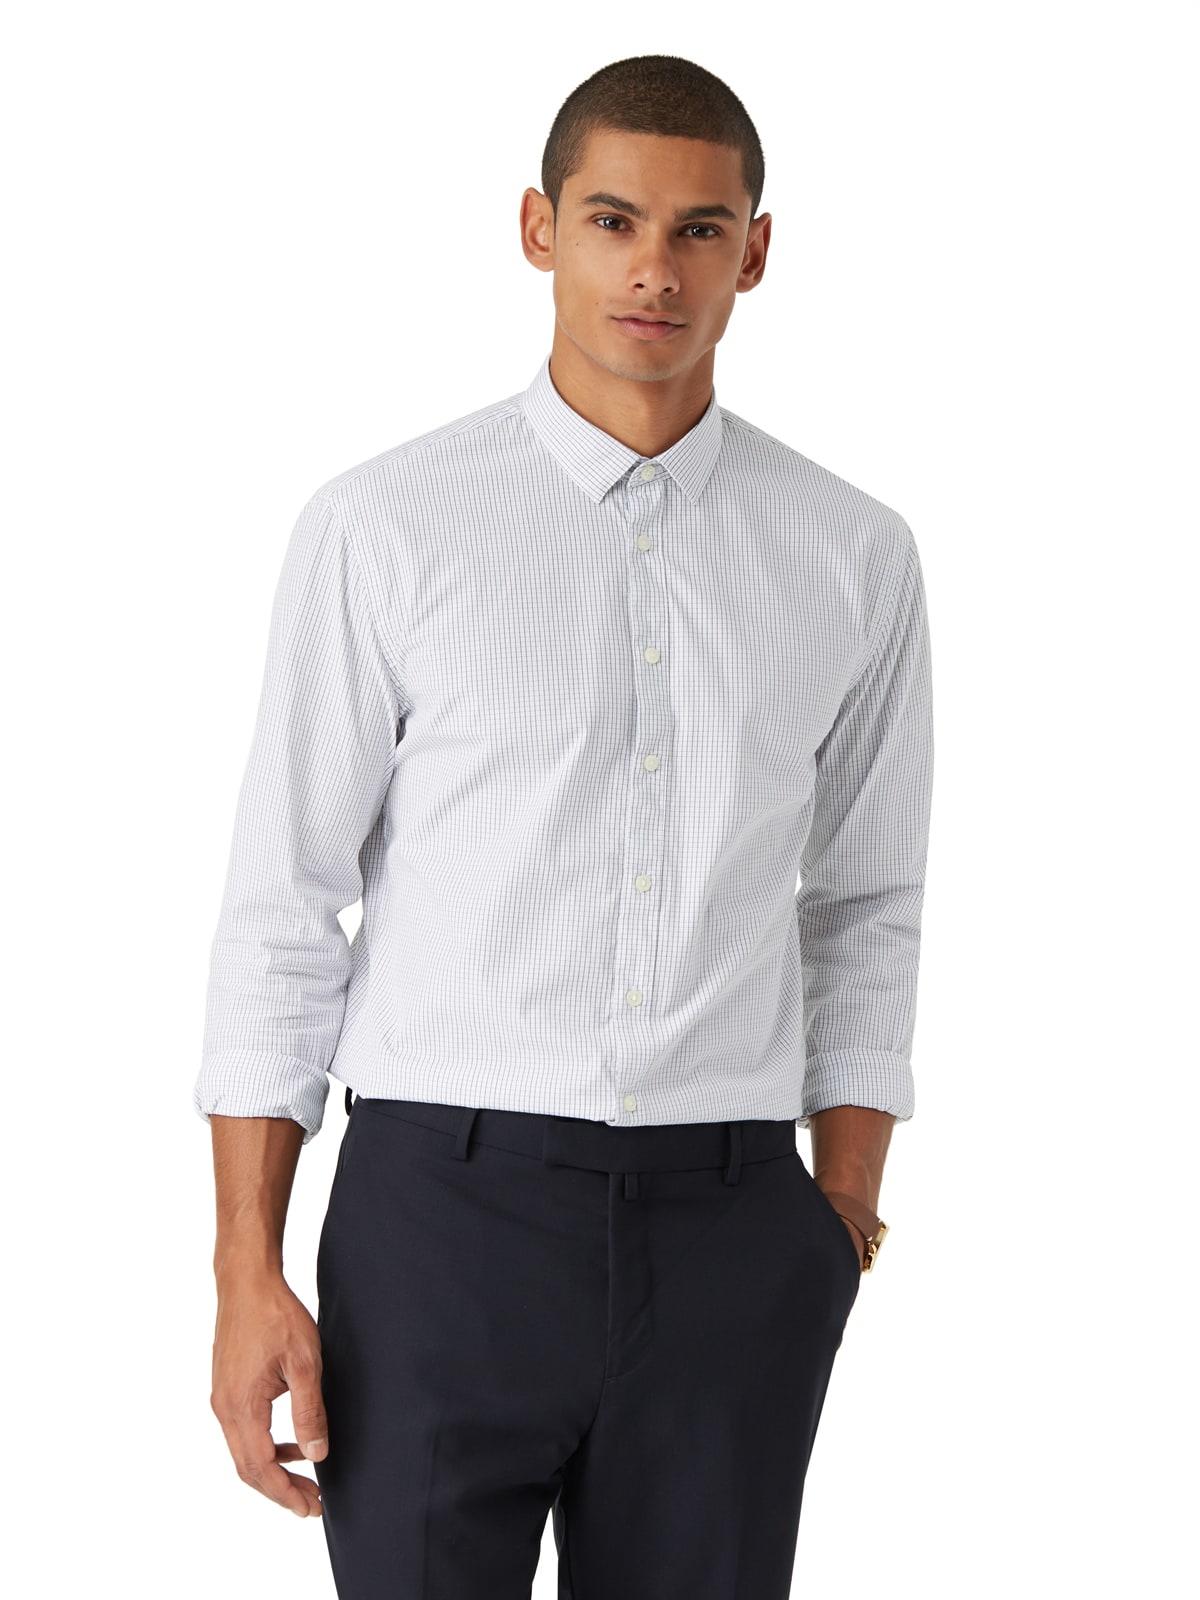 Frank oak micro windowpane andover dress shirt in white for Frank and oak shirt